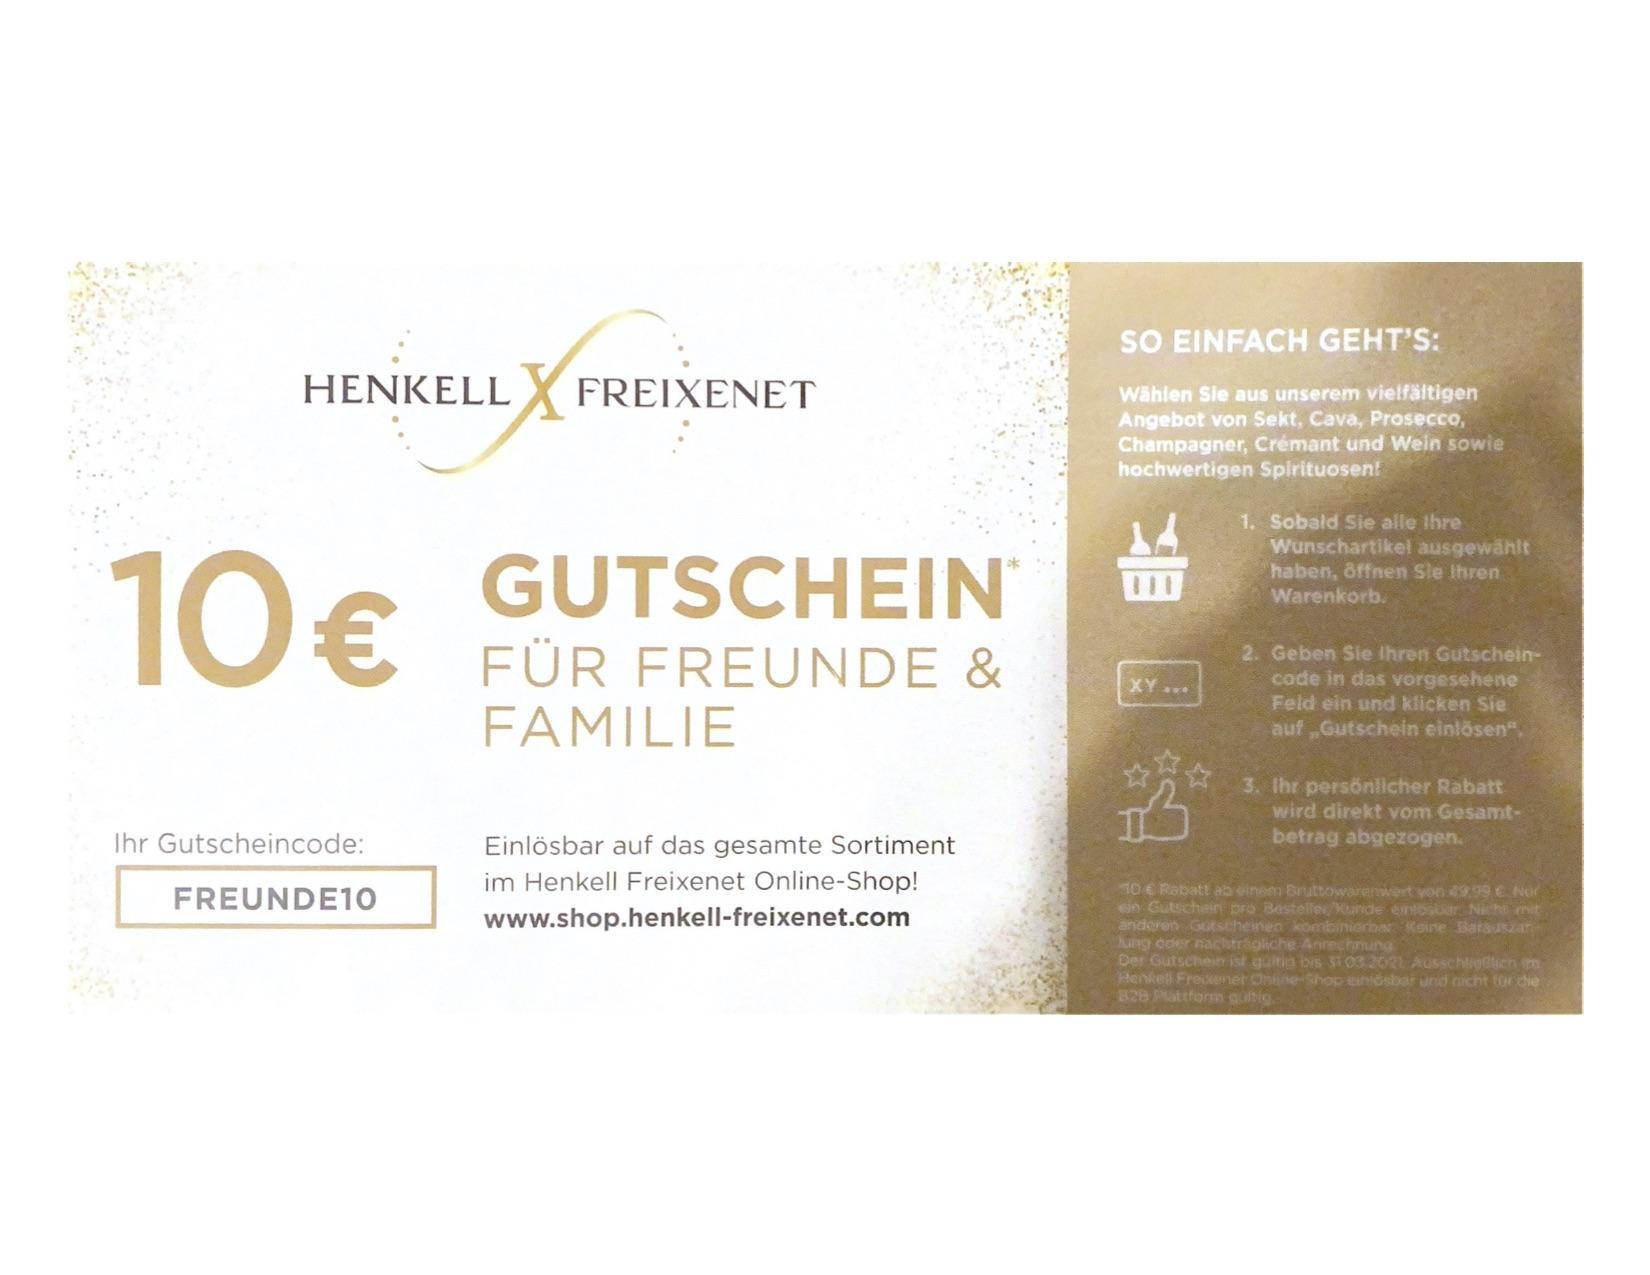 Henkell & Freixenet - 10€ Gutschein